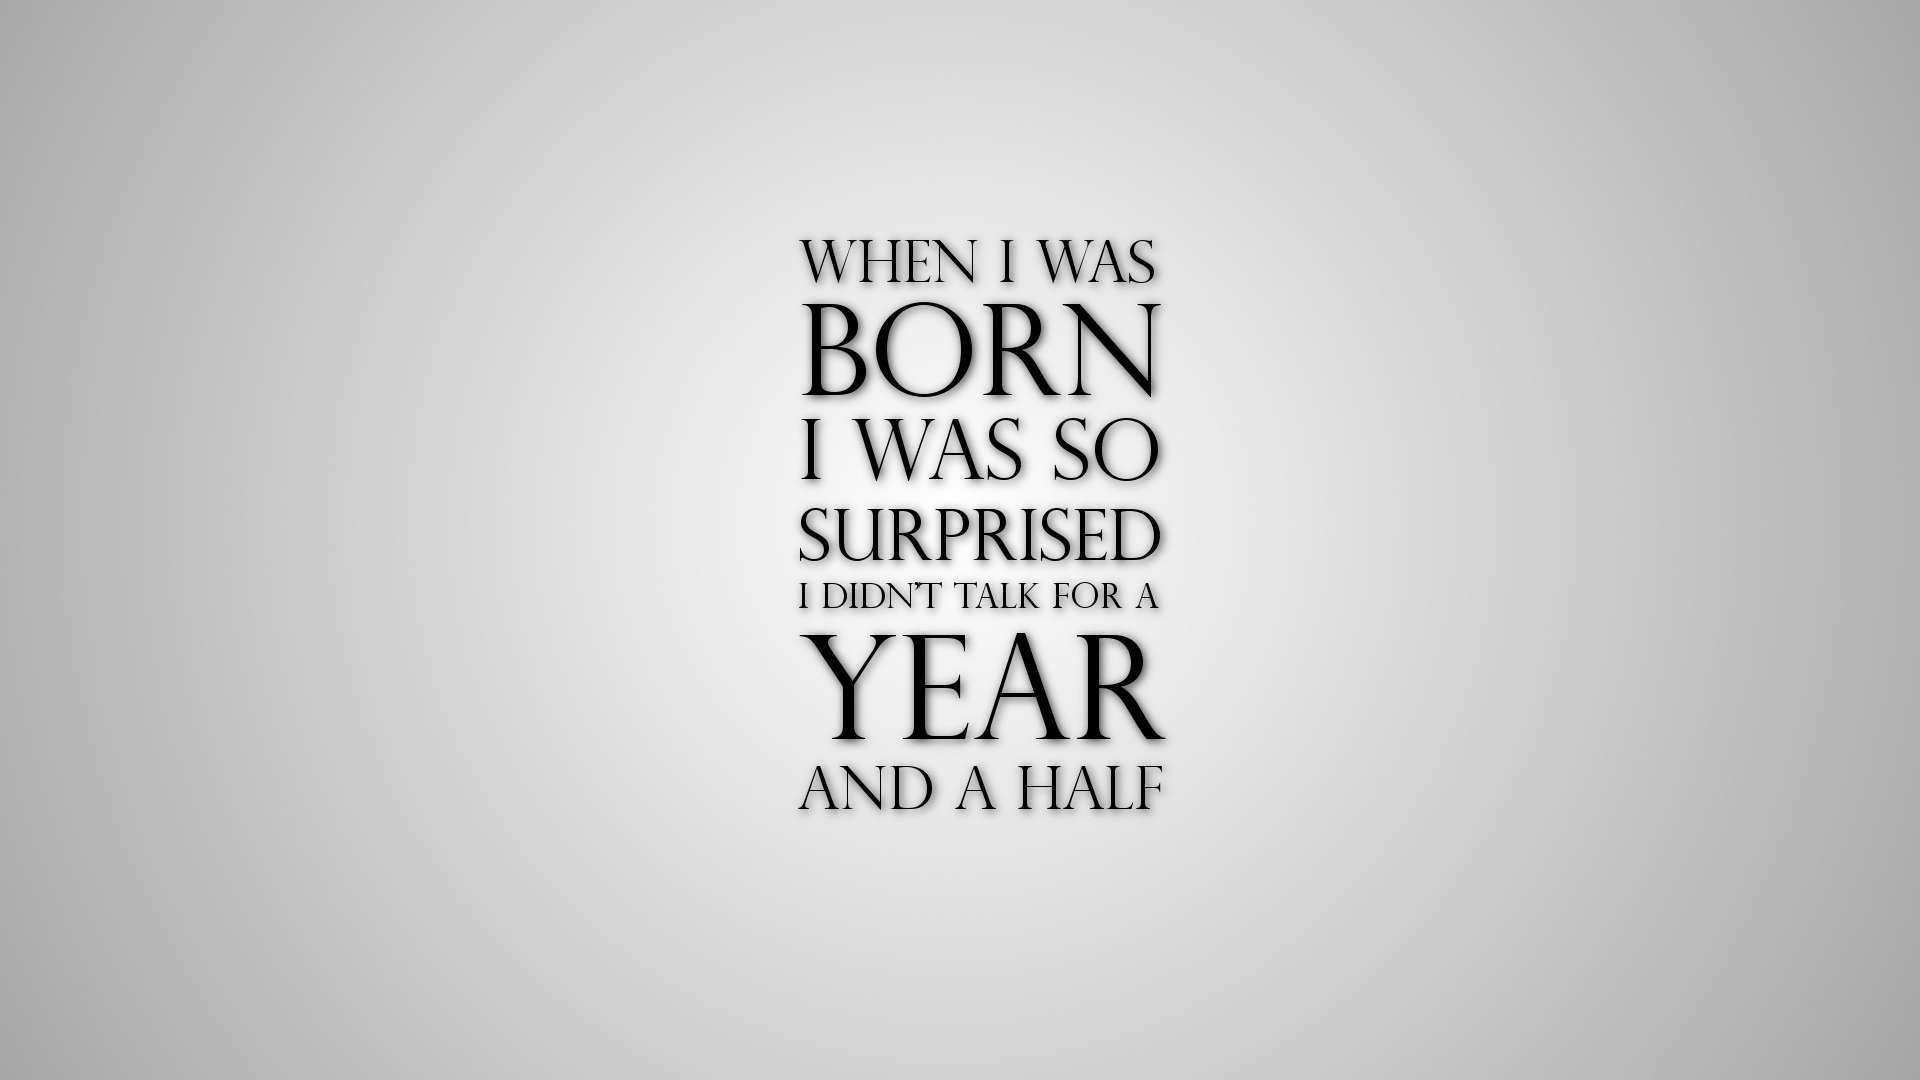 When I Was Born Hd Wallpaper Fullhdwpp Full Hd Wallpapers 1920x1080 Life Quotes Wallpaper Best Quotes Funny Quotes